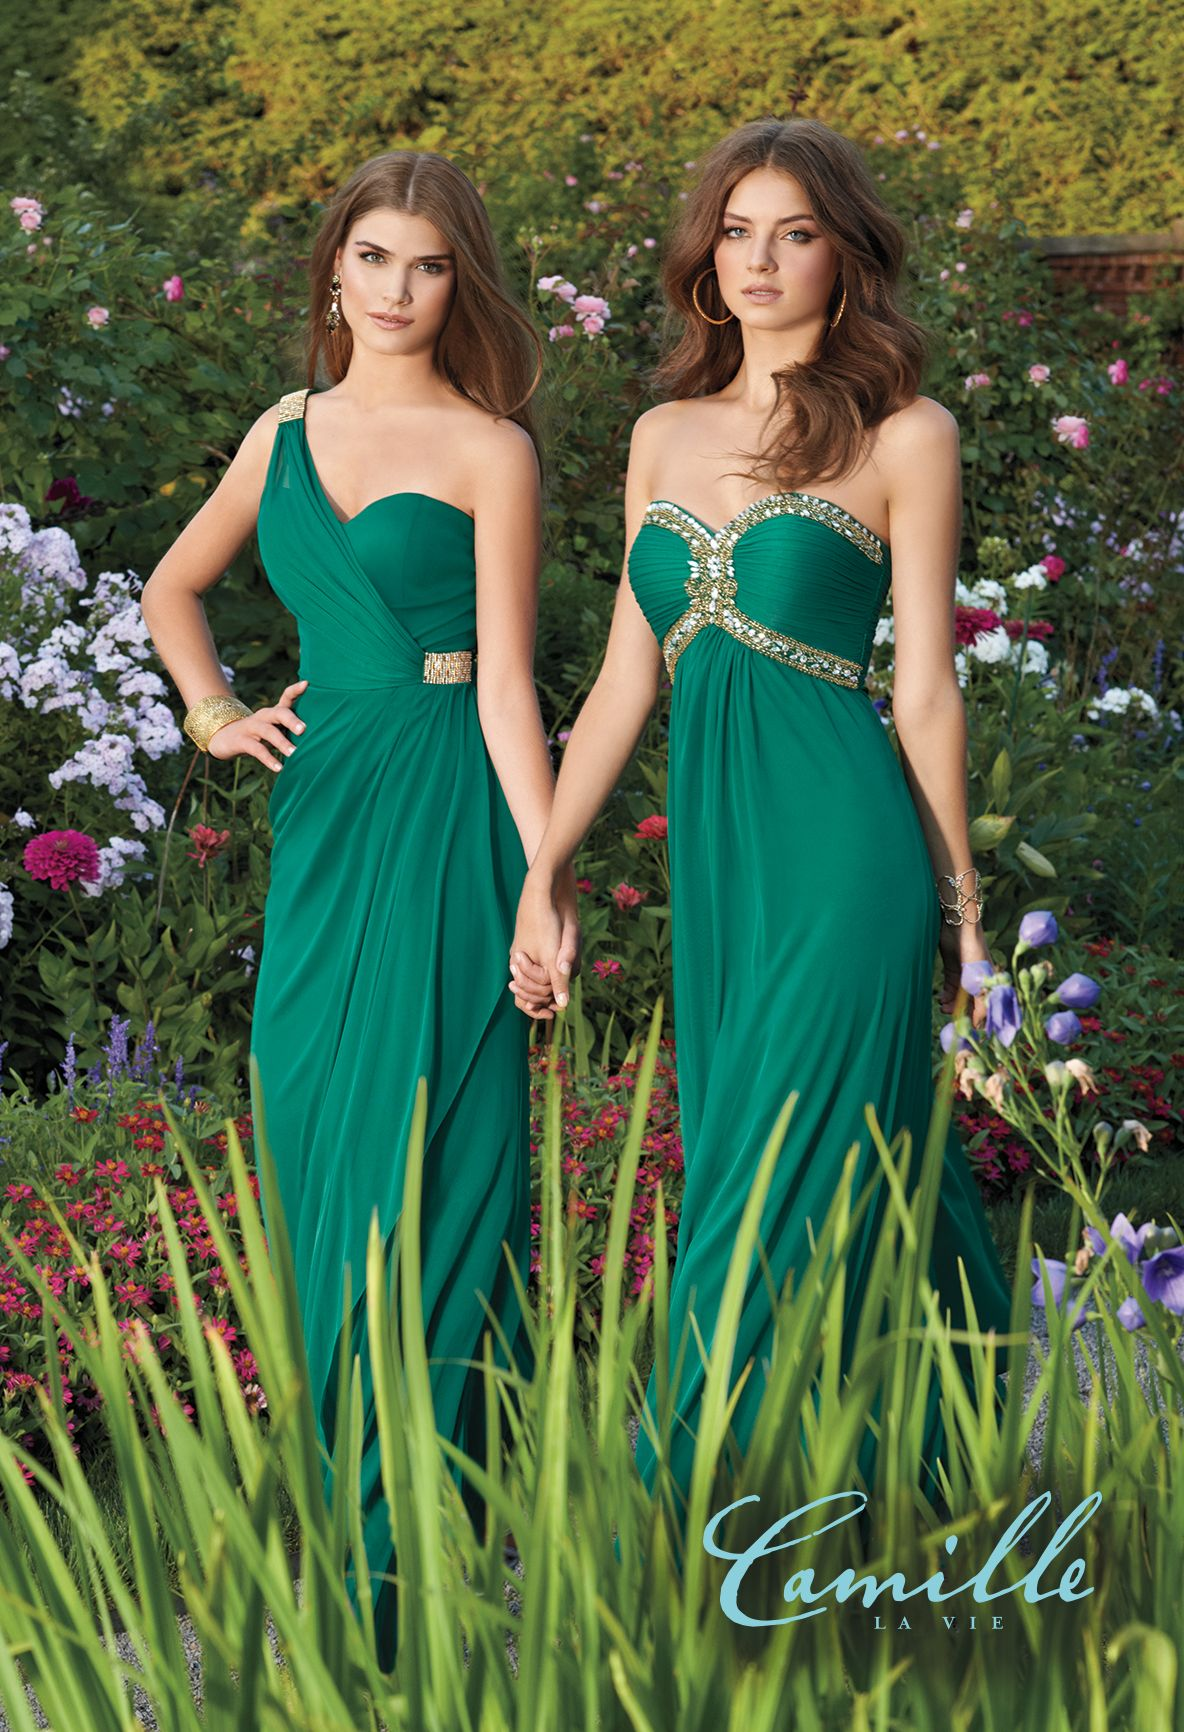 Green bridesmaid long dresses camille la vie wedding dresses one shoulder rhinestone trim dress from camille la vie and group usa shrek princesses karen and carol ombrellifo Images